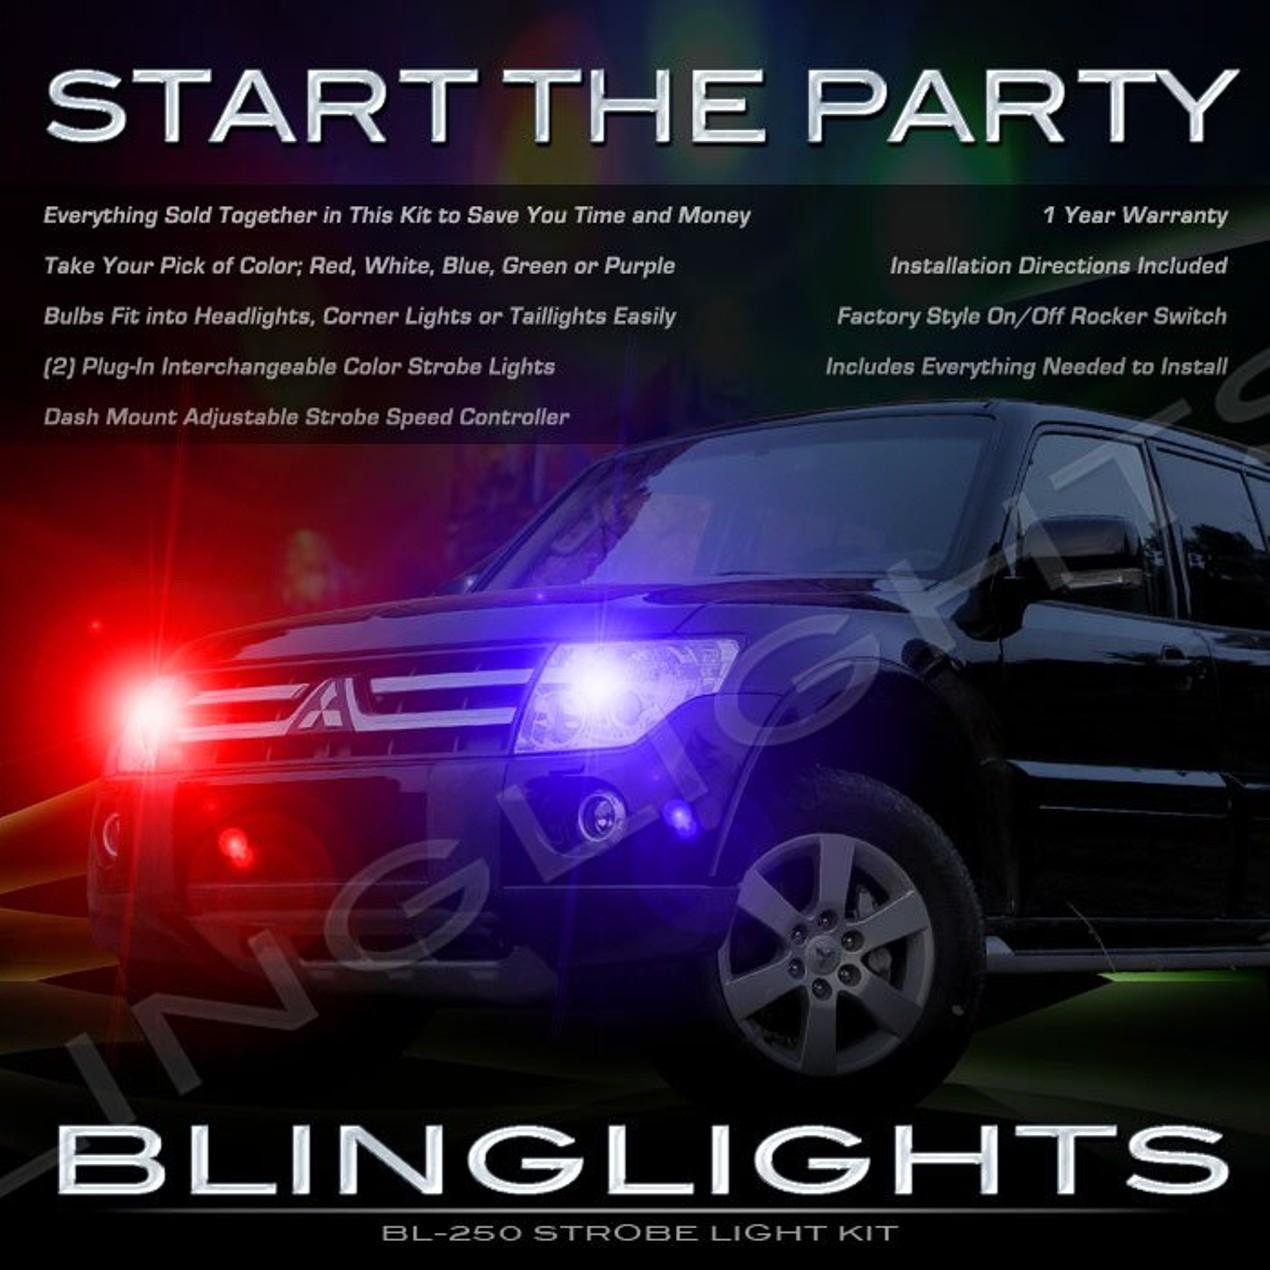 New Mitsubishi Nativa Strobe Police Light Kit For Headlamps Adjustable Headlights Head